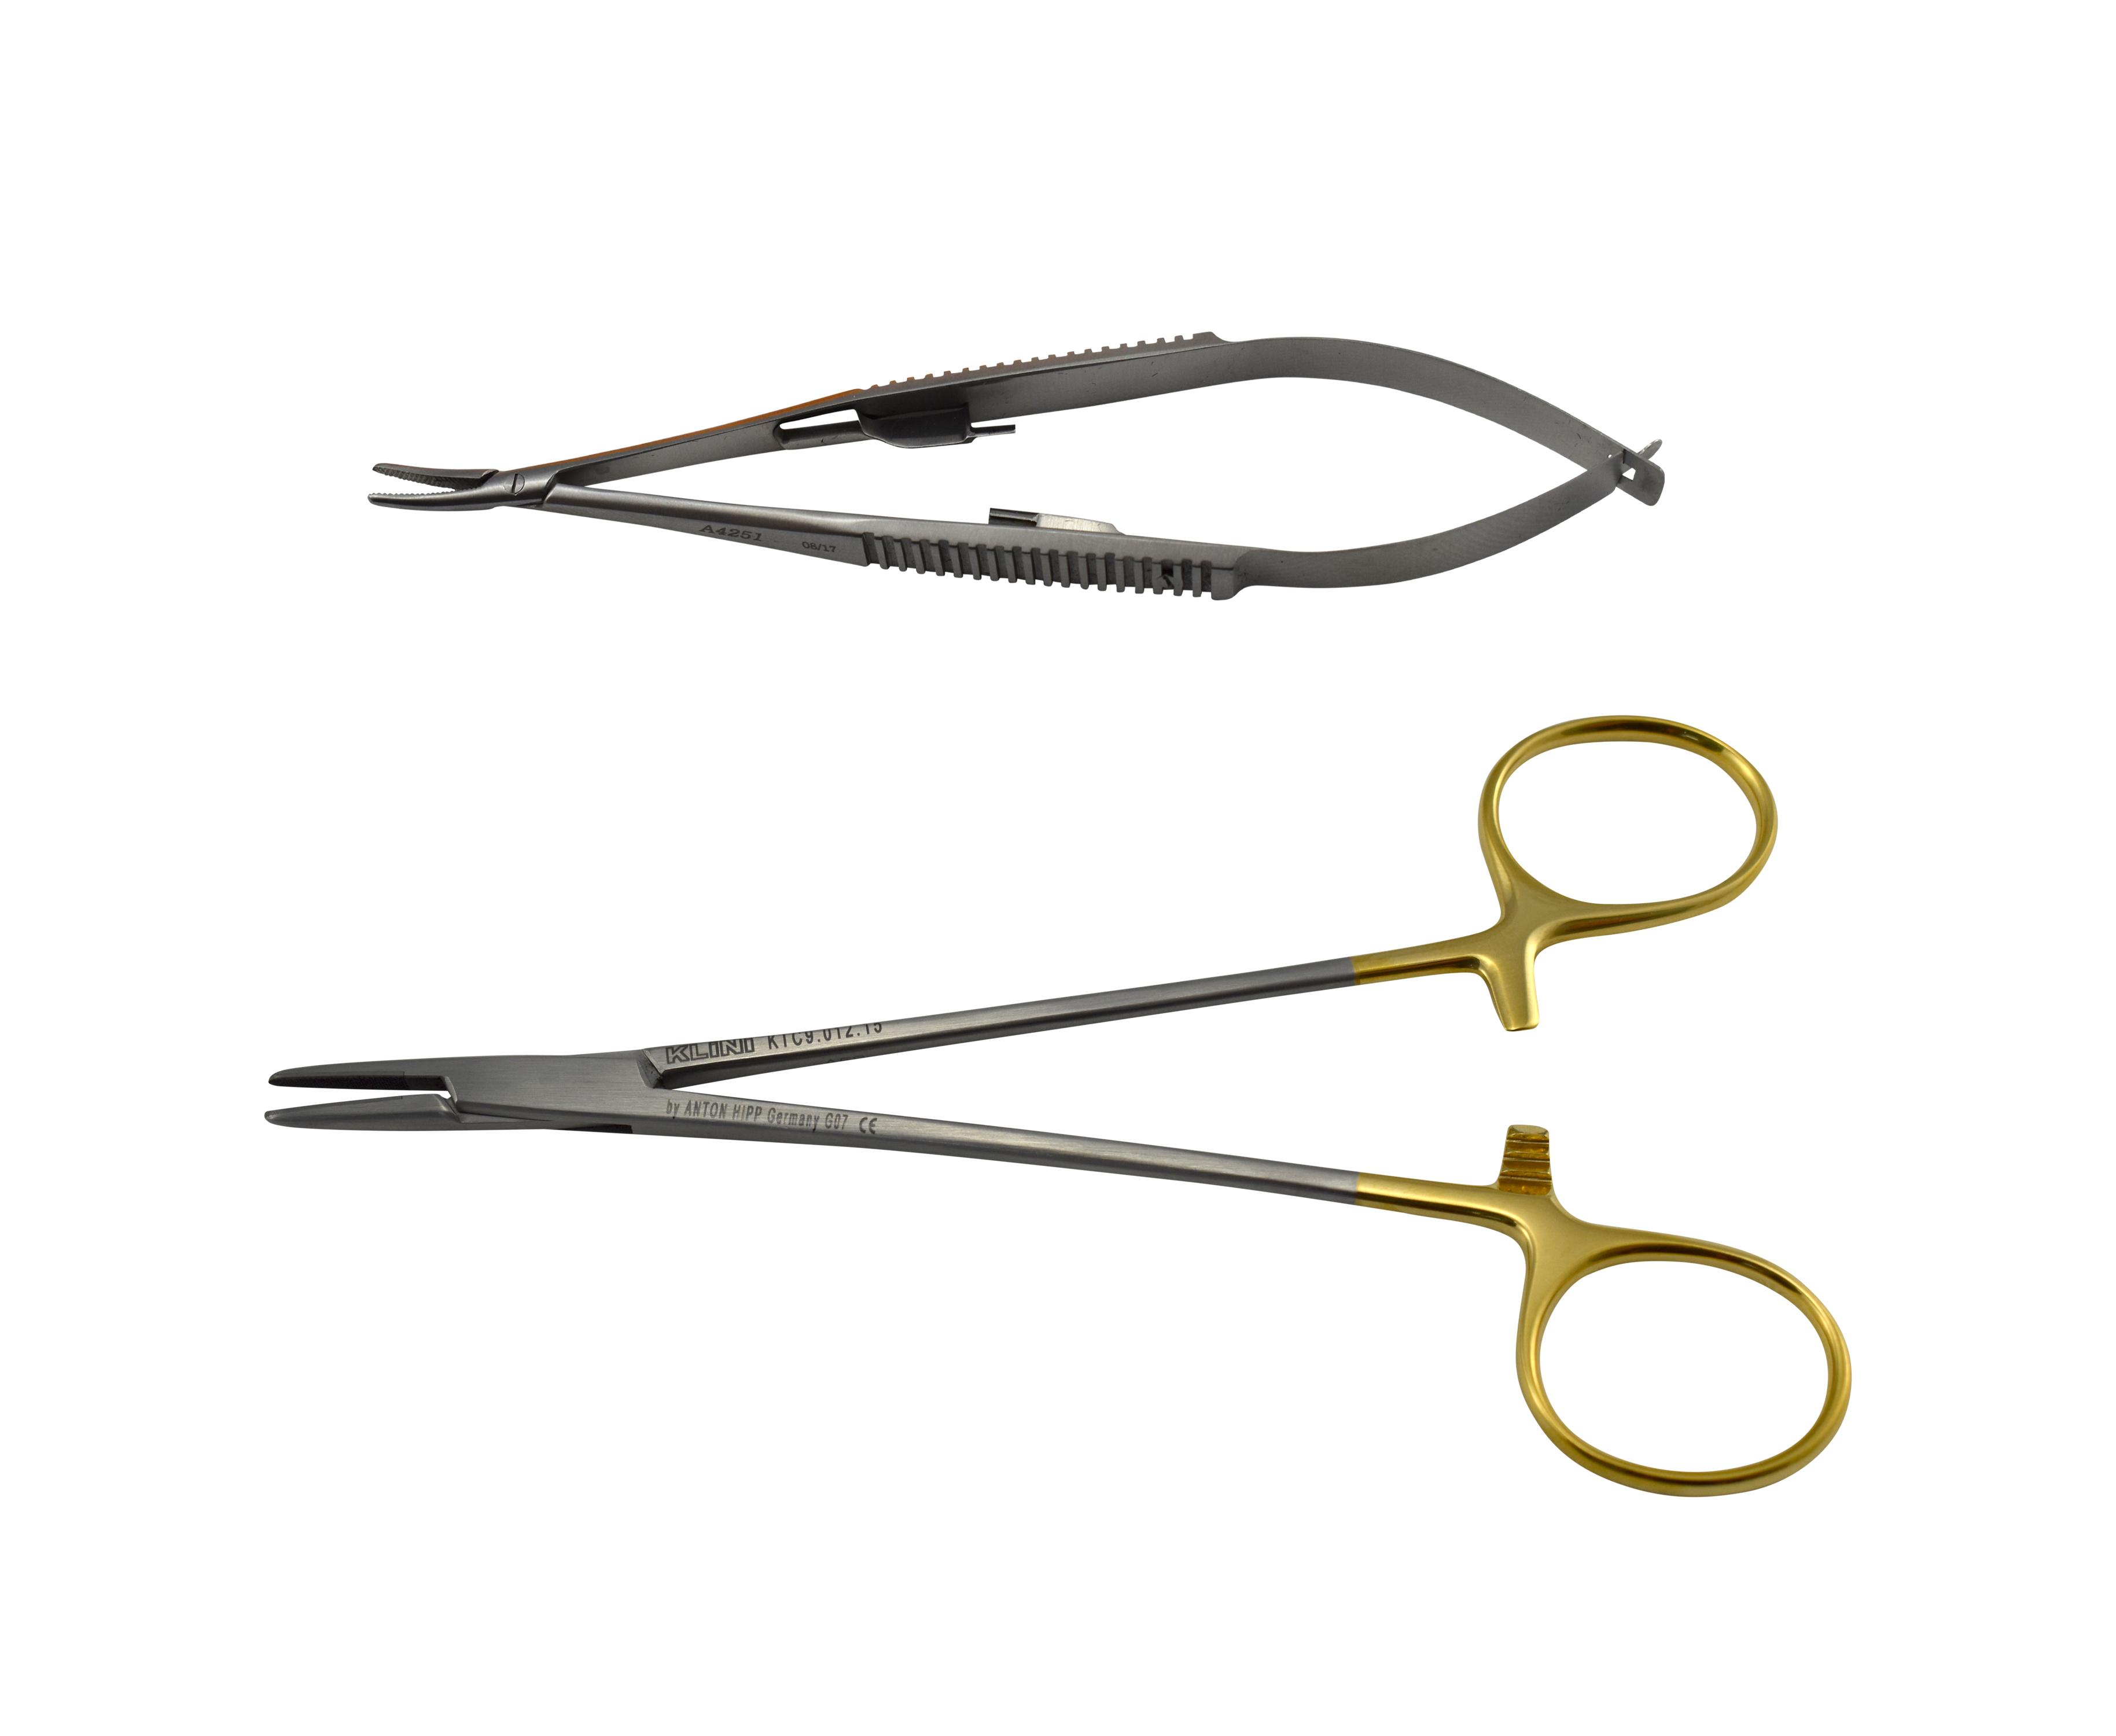 Other Needle Holders